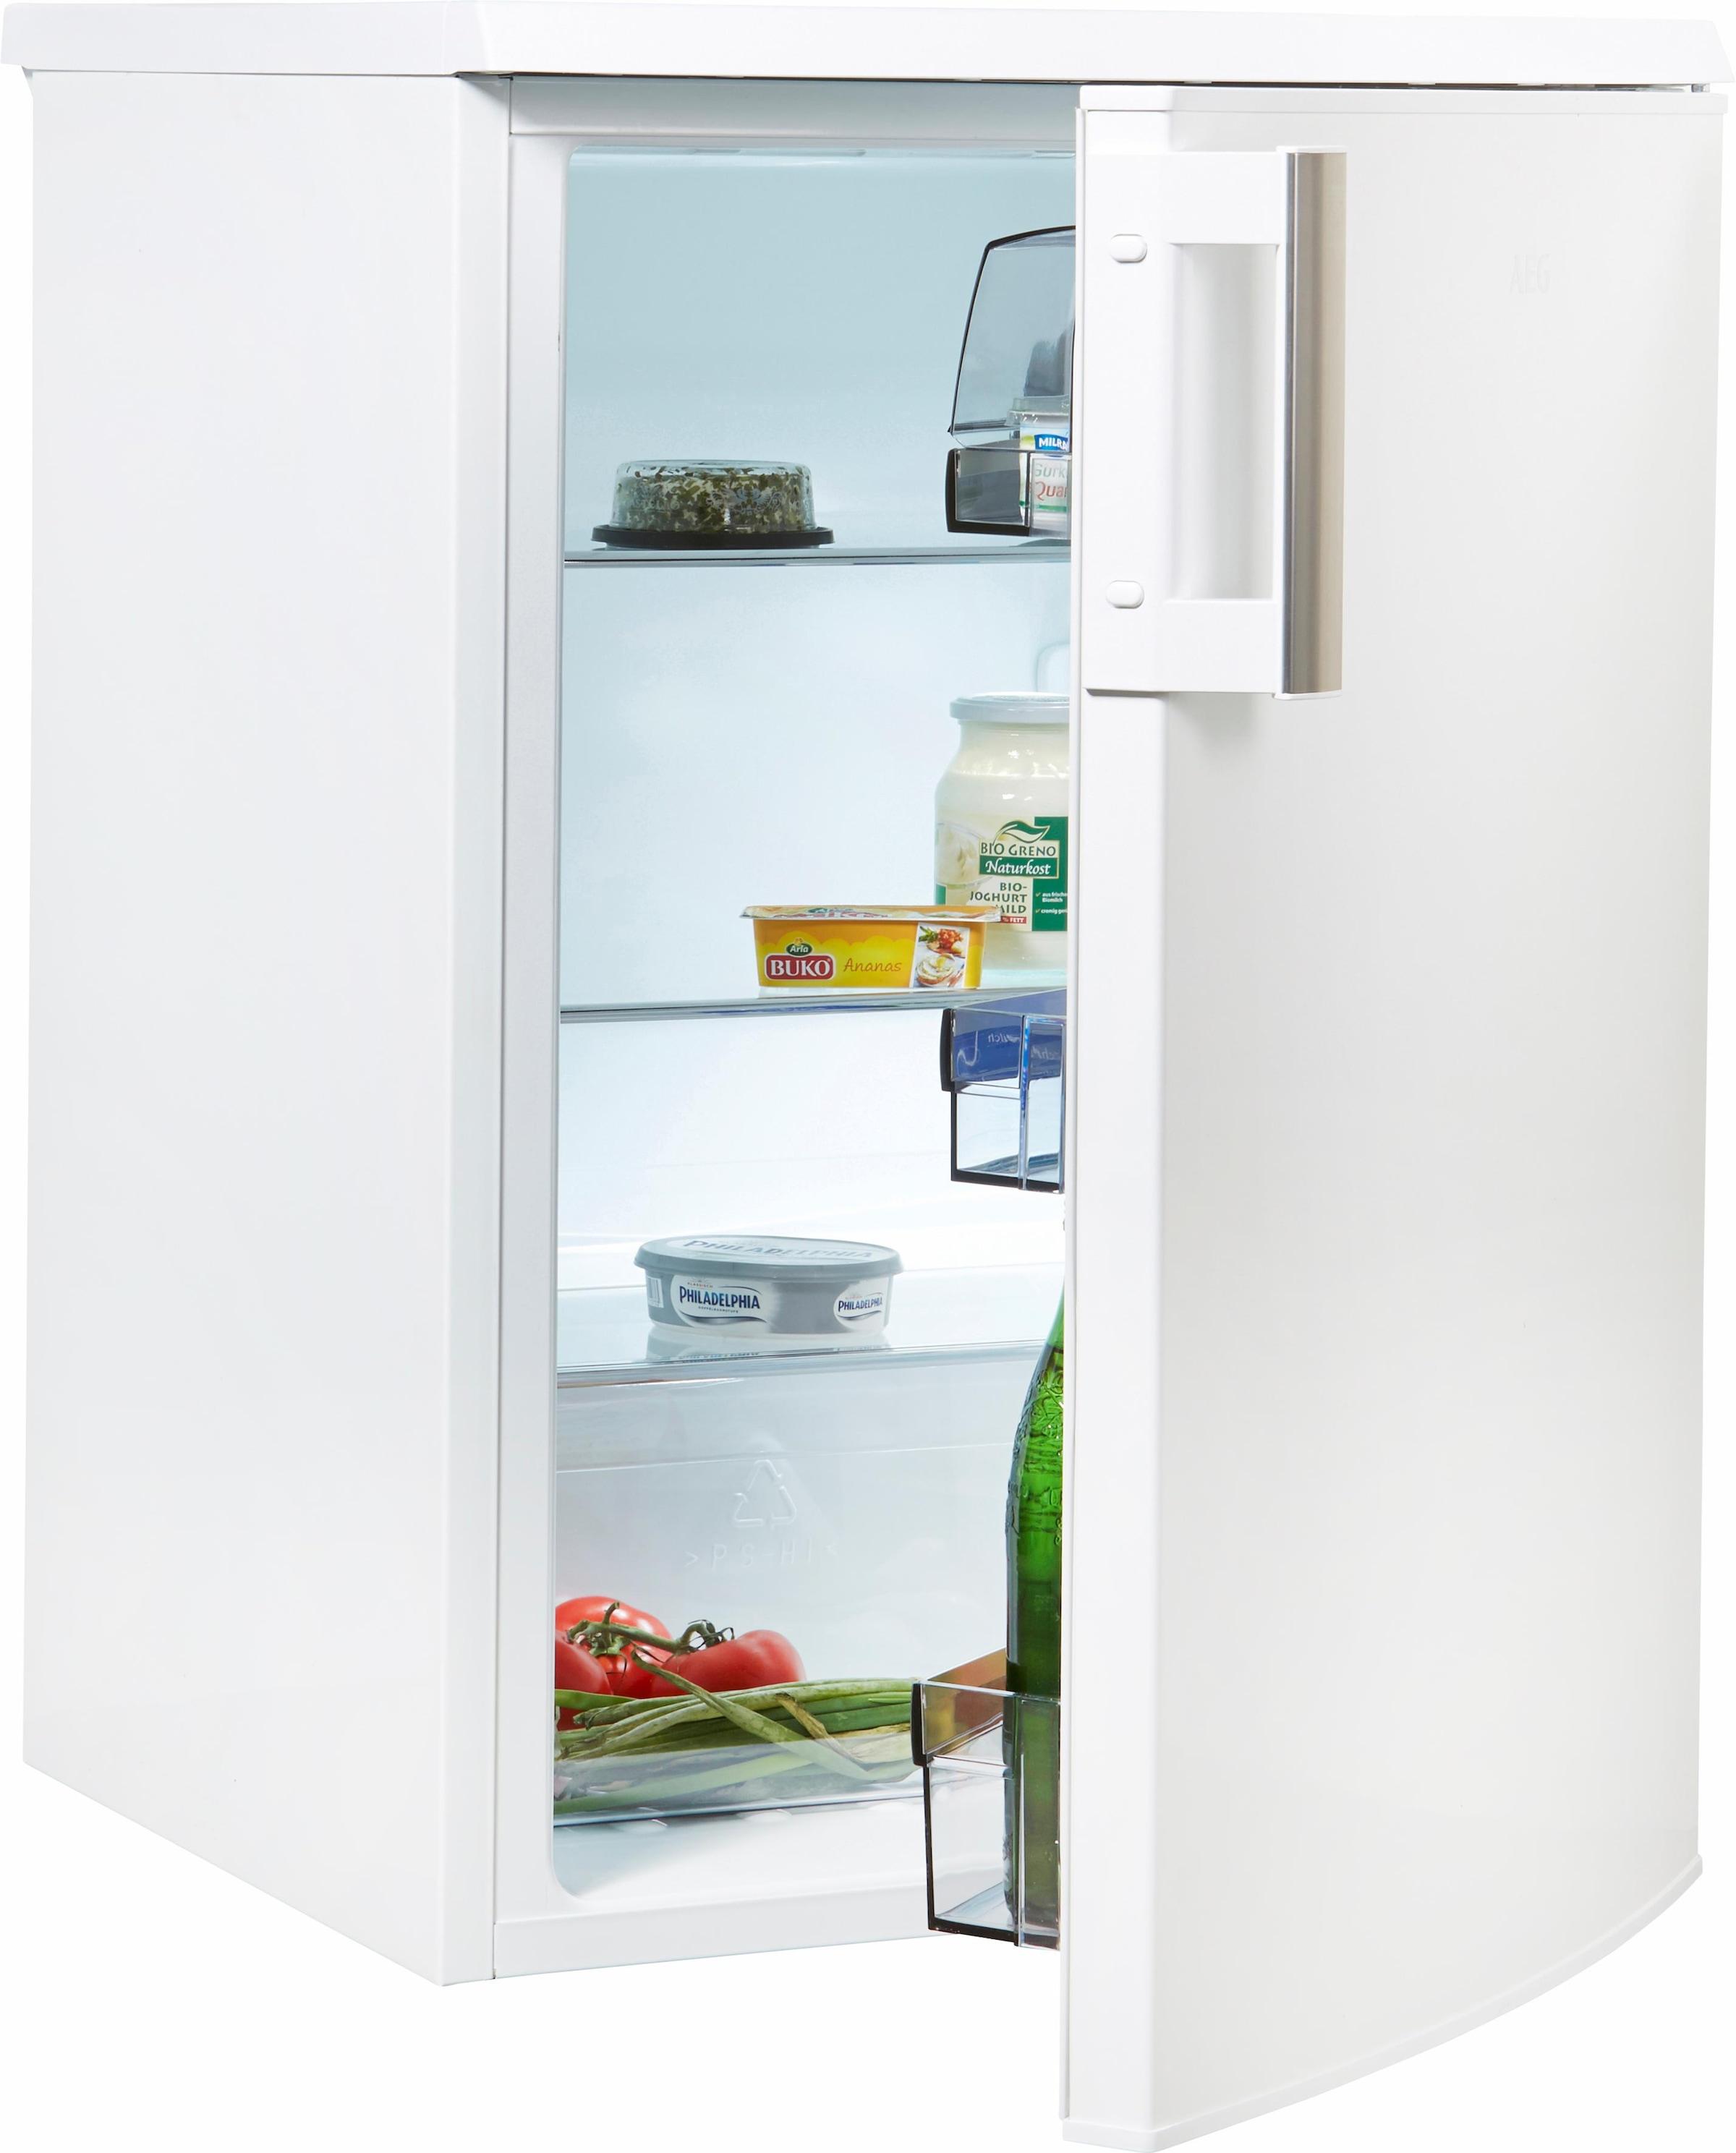 Aeg Kühlschrank Rtb91531aw : Aeg kühlschrank rtb aw cm hoch per rechnung baur